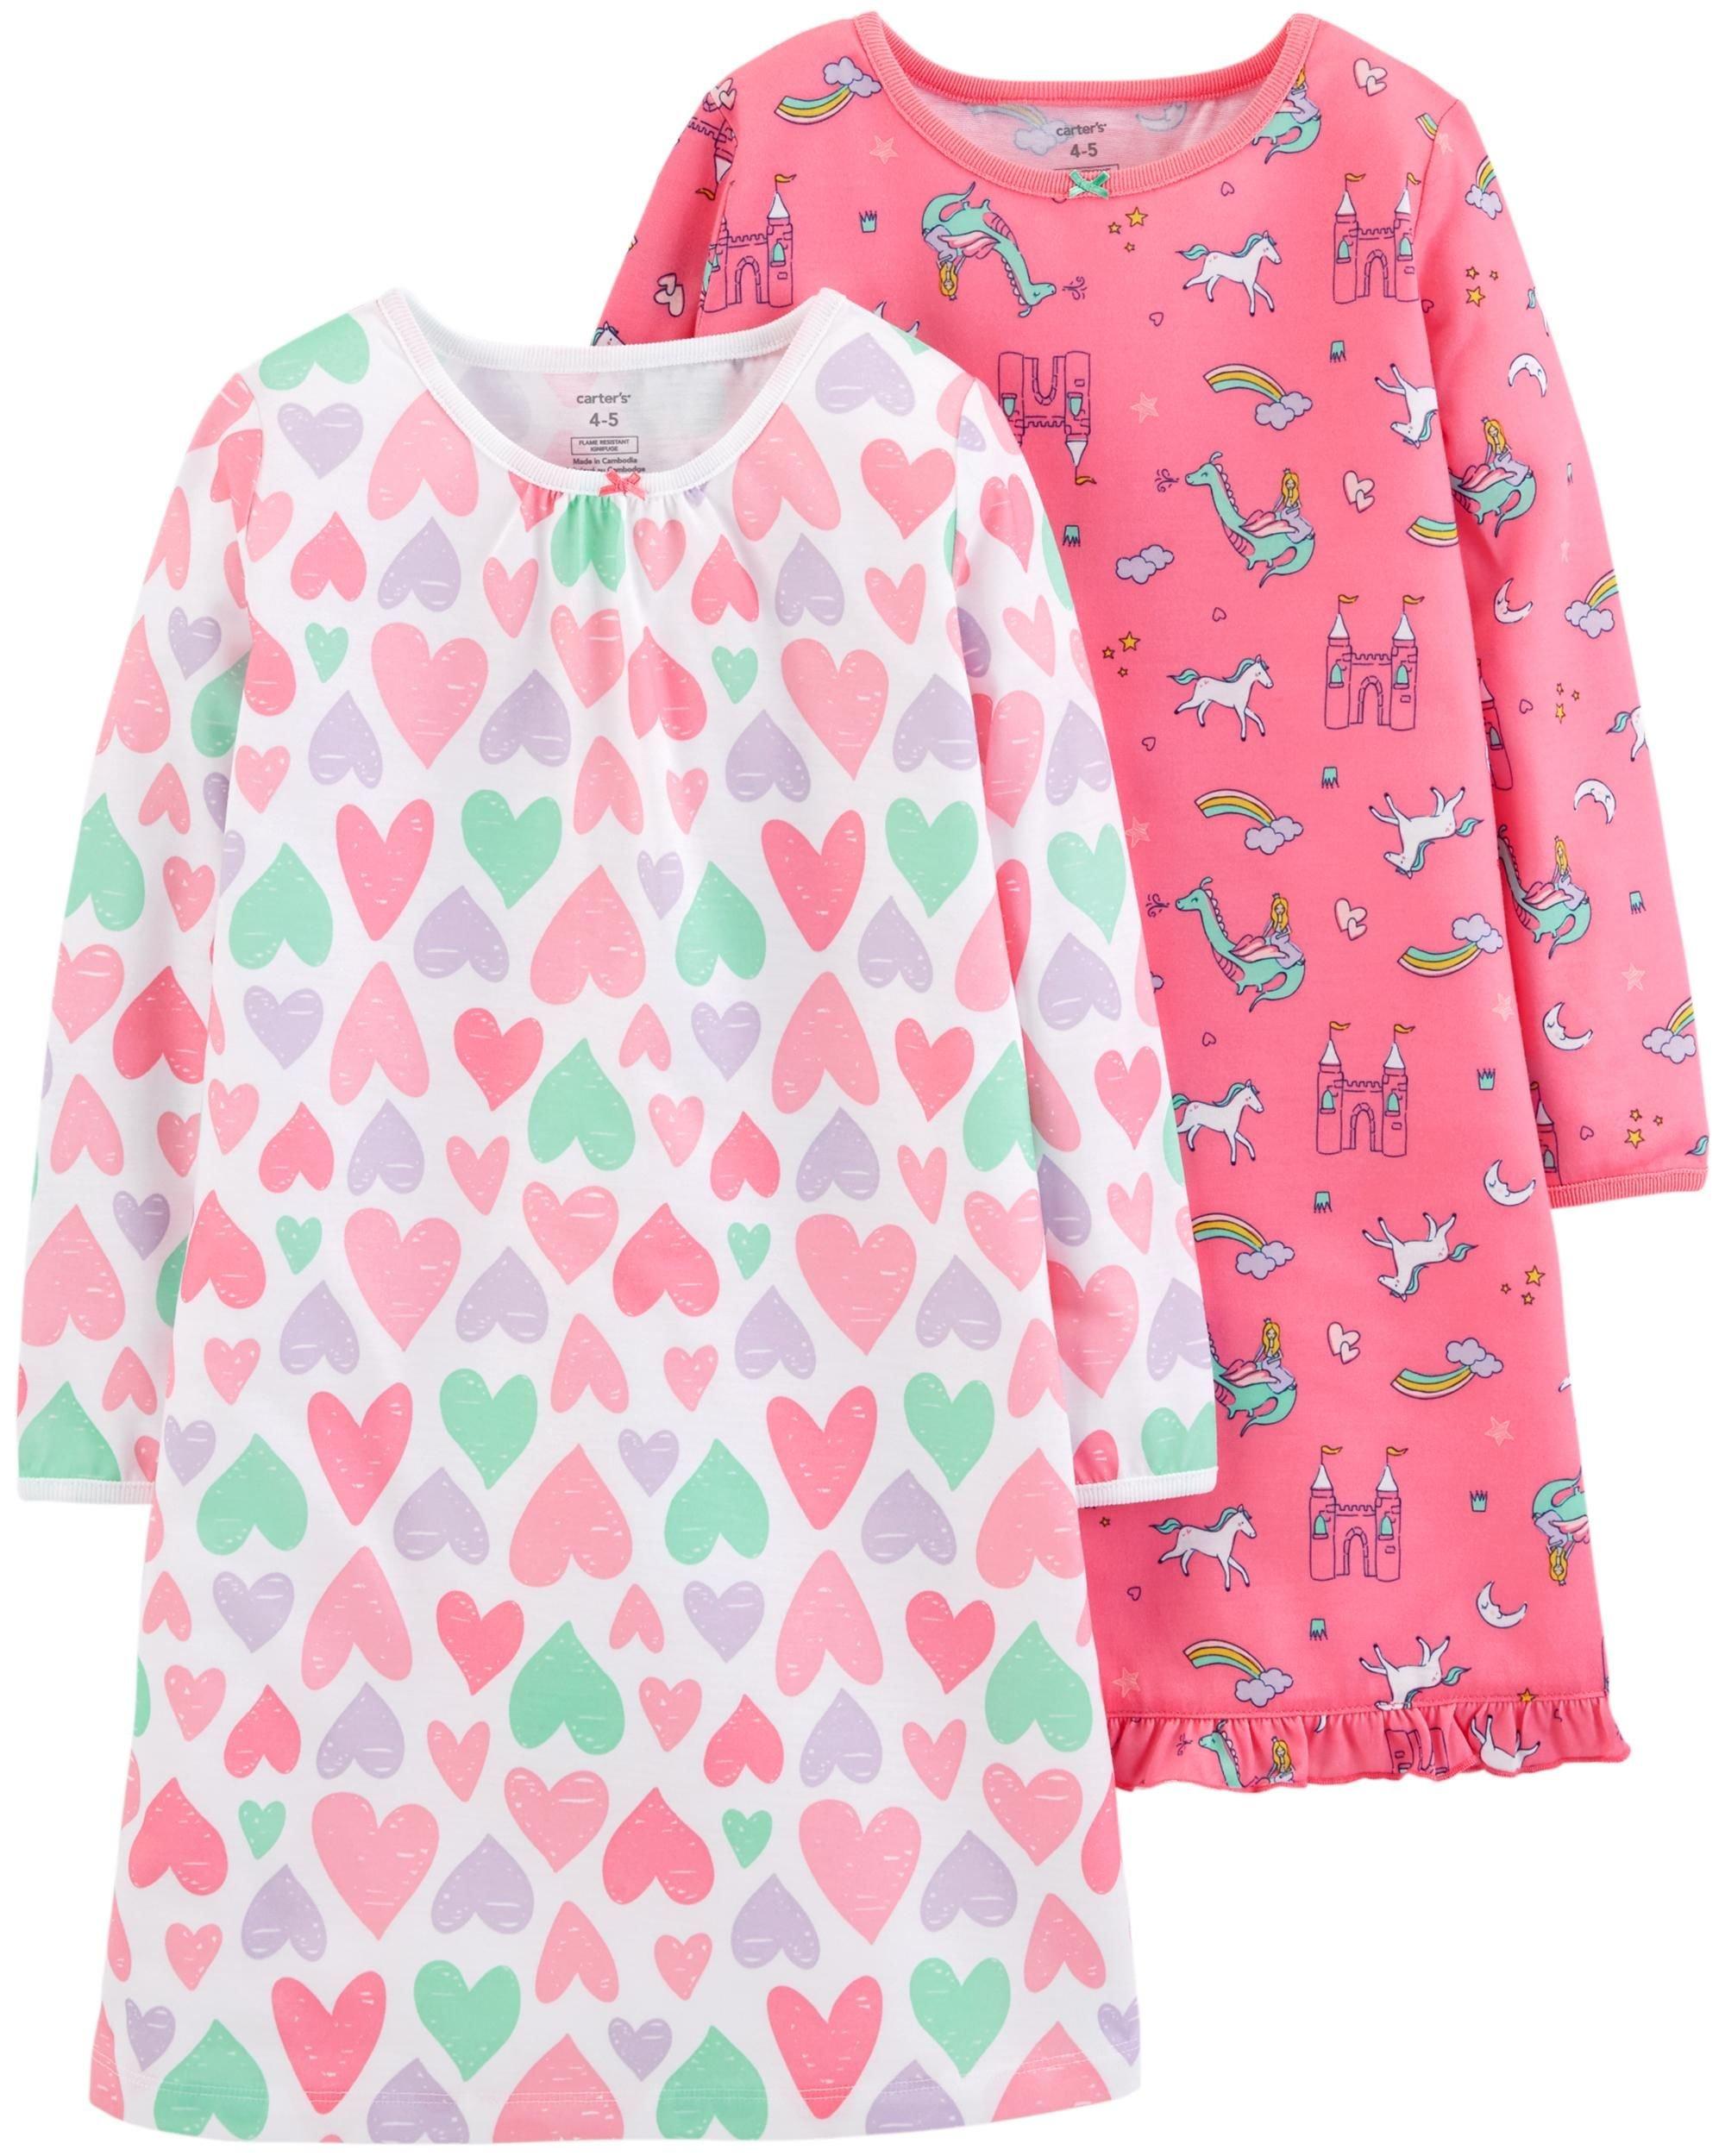 Carter's Girls 2-Pack Sleep Gowns, Unicorn Hearts, 4-5